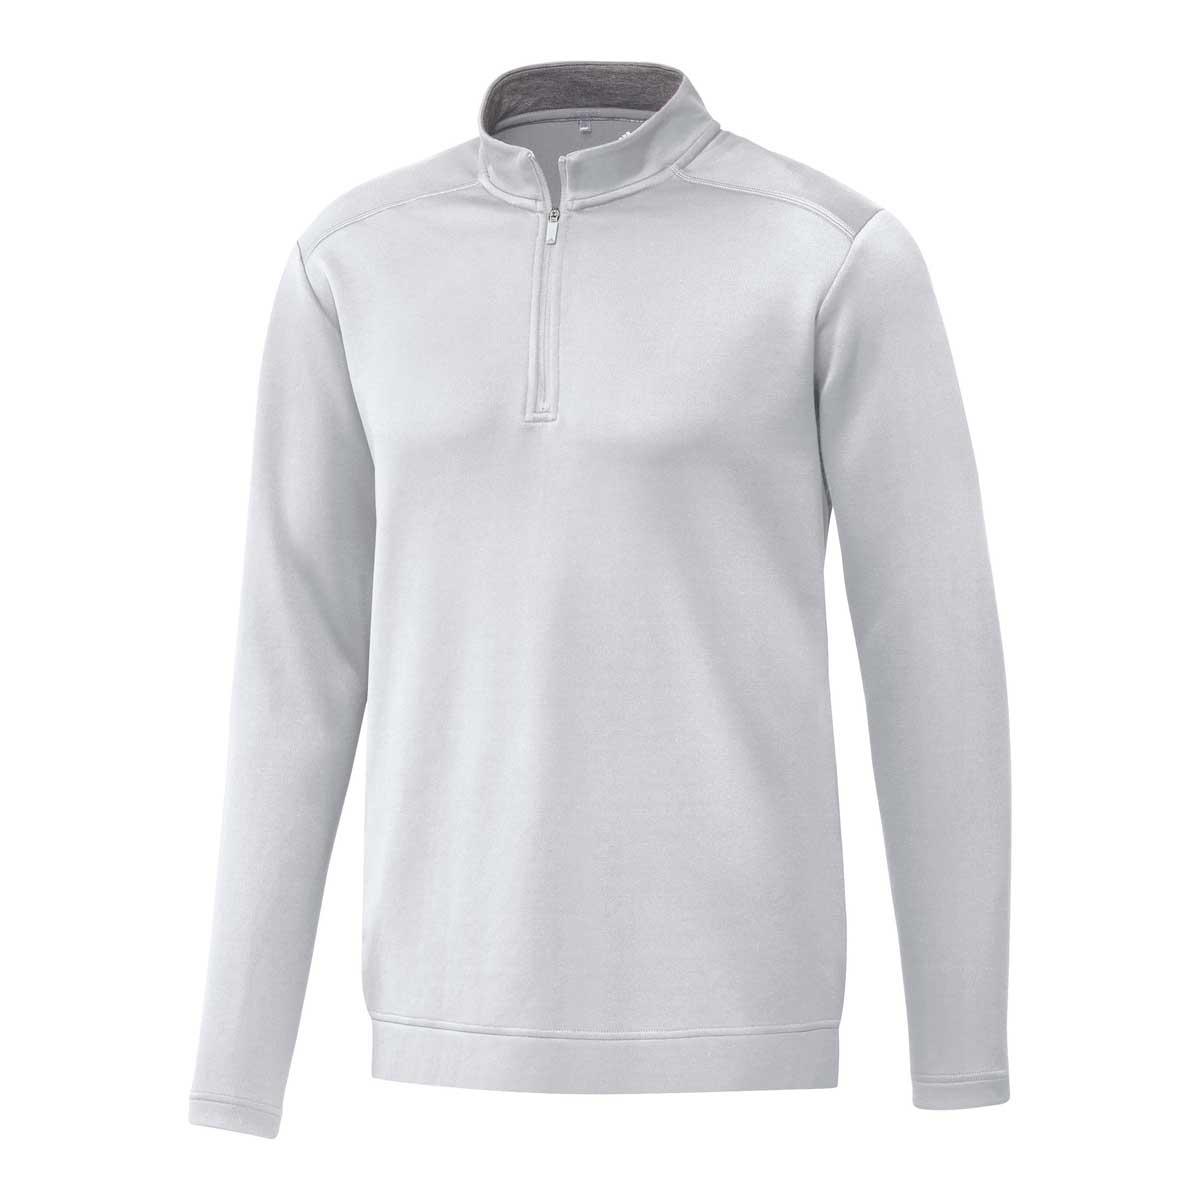 Adidas Men's Club 1/4 Zip White Pullover